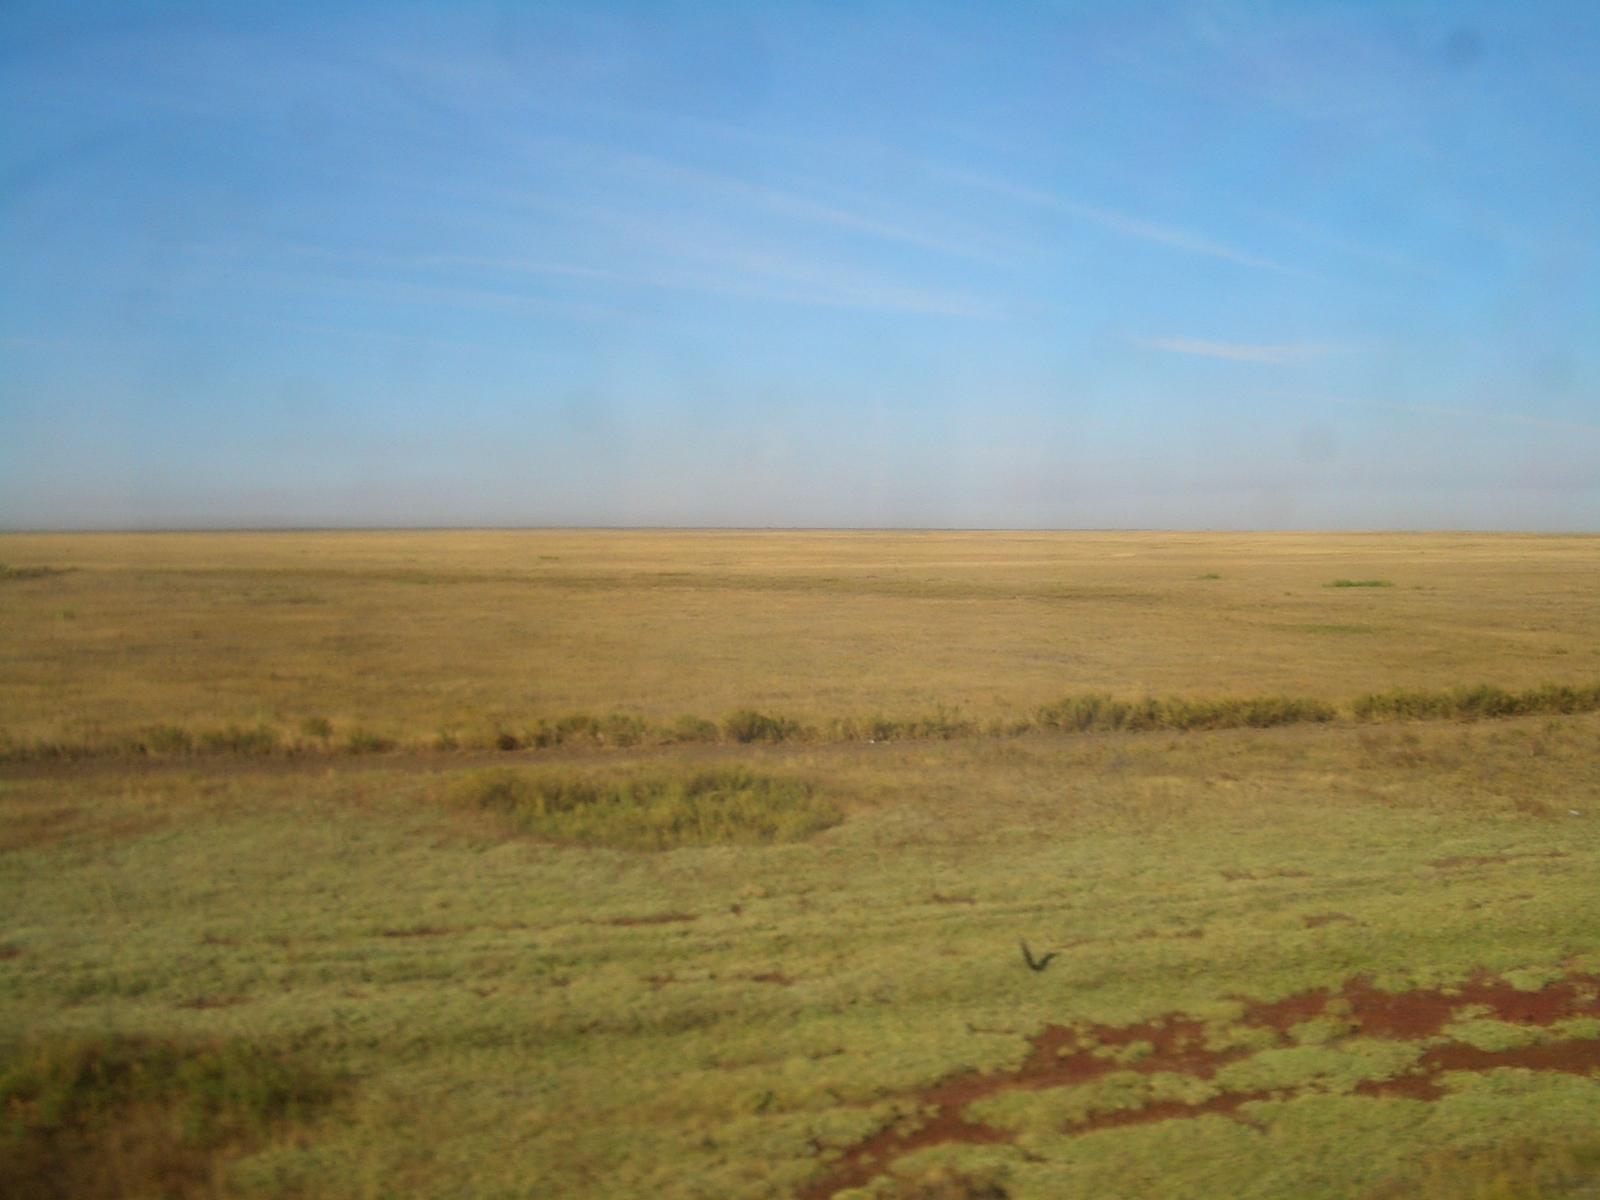 Kazakh Steppe - Wikipedia on